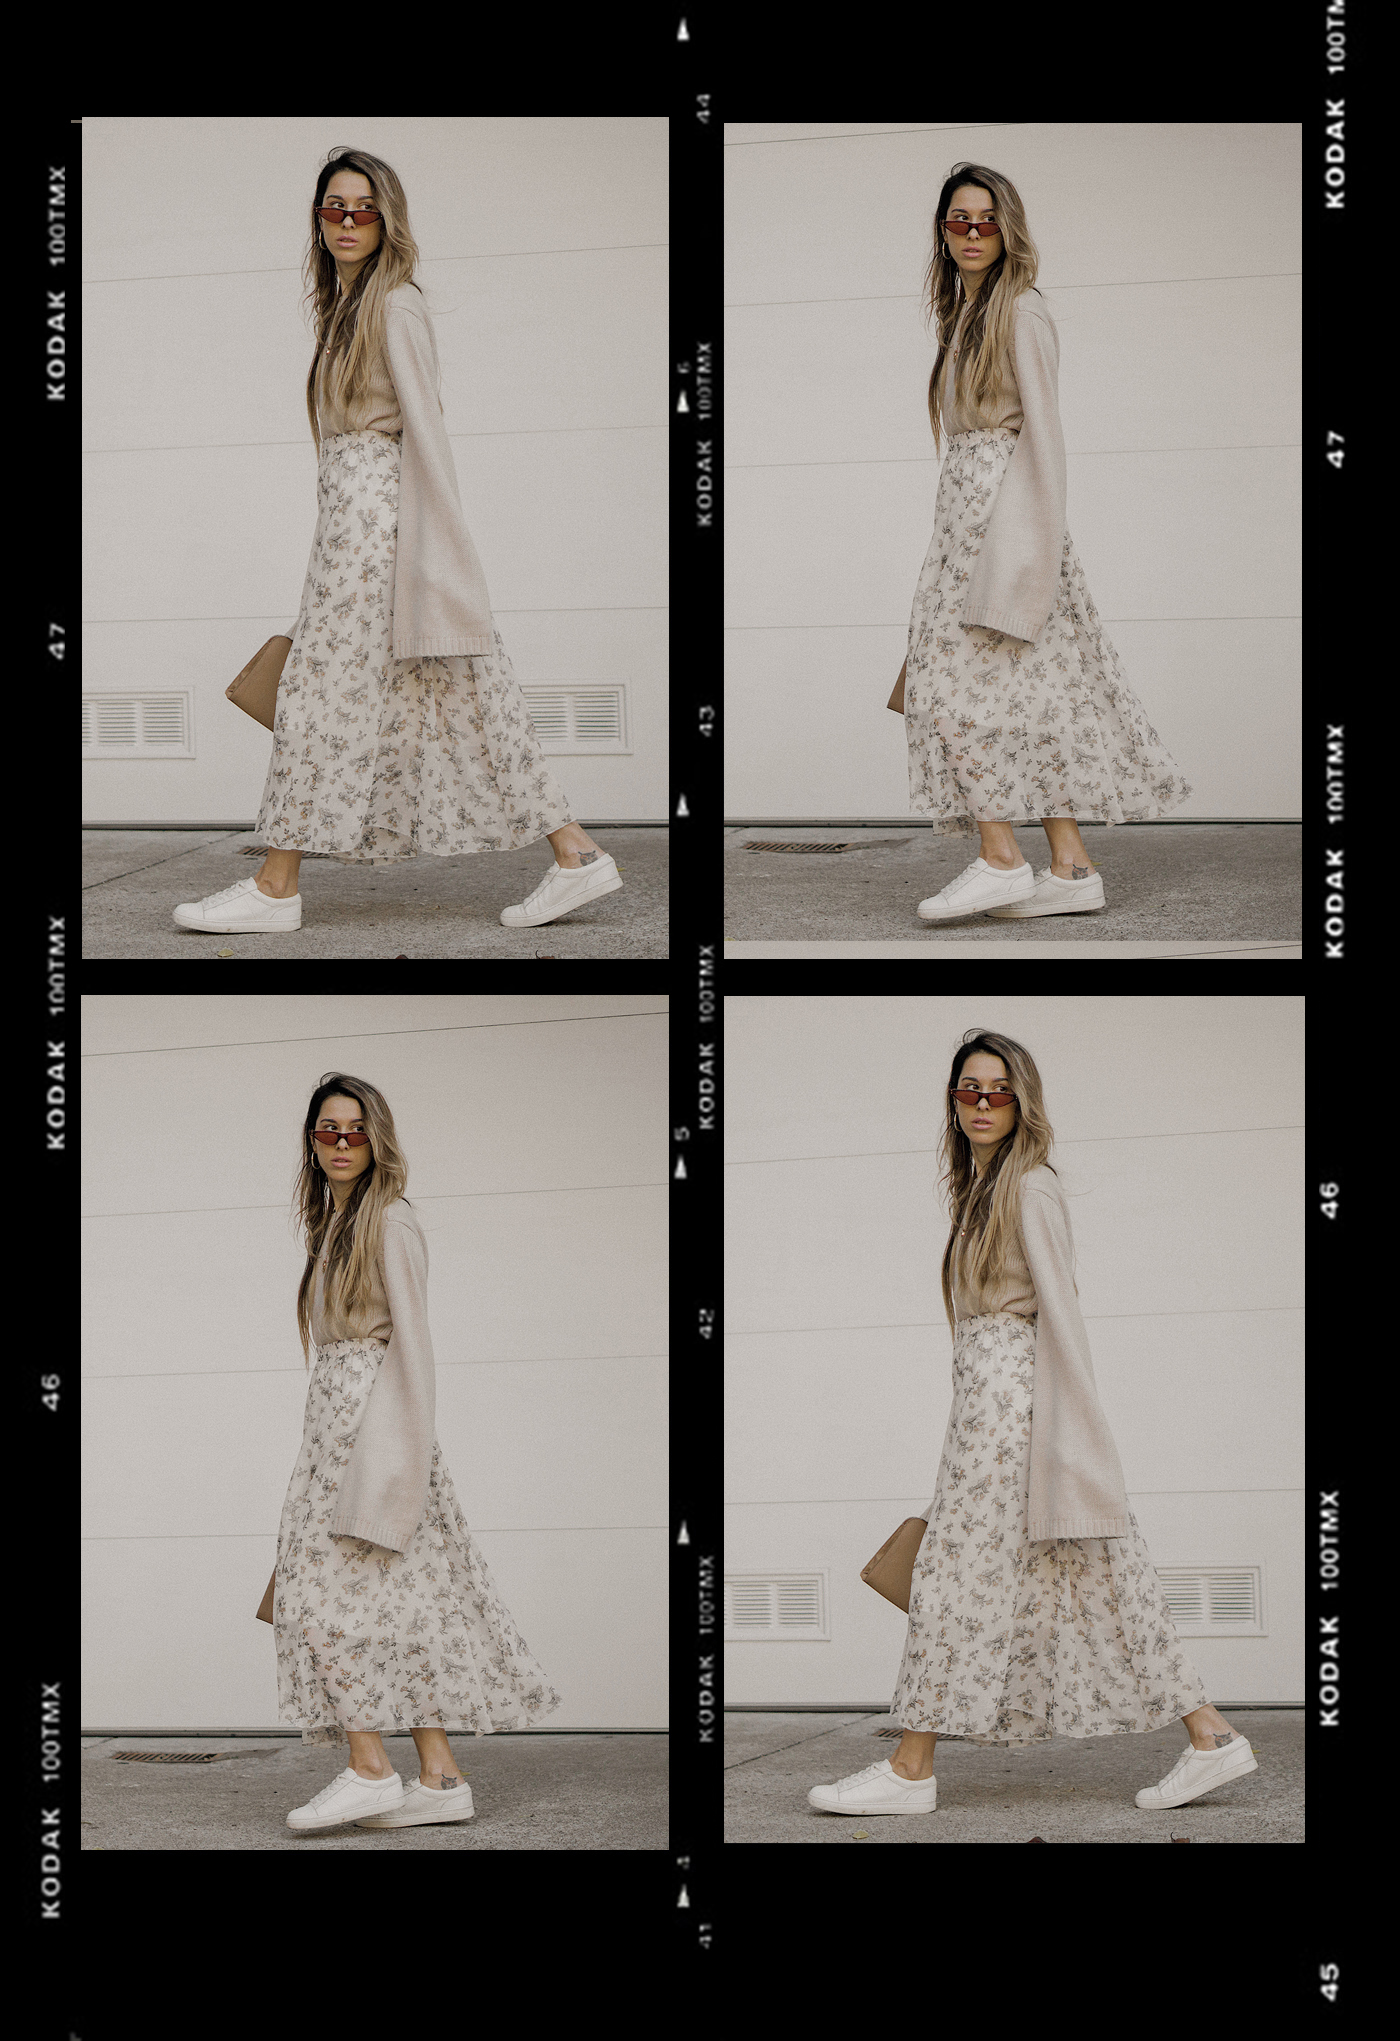 neutral_outfit_street_style_look_beige_tobi_sweater_long_skirt_romantic_beret_sneakers_vintage_lena_juice_the_white_ocean_07